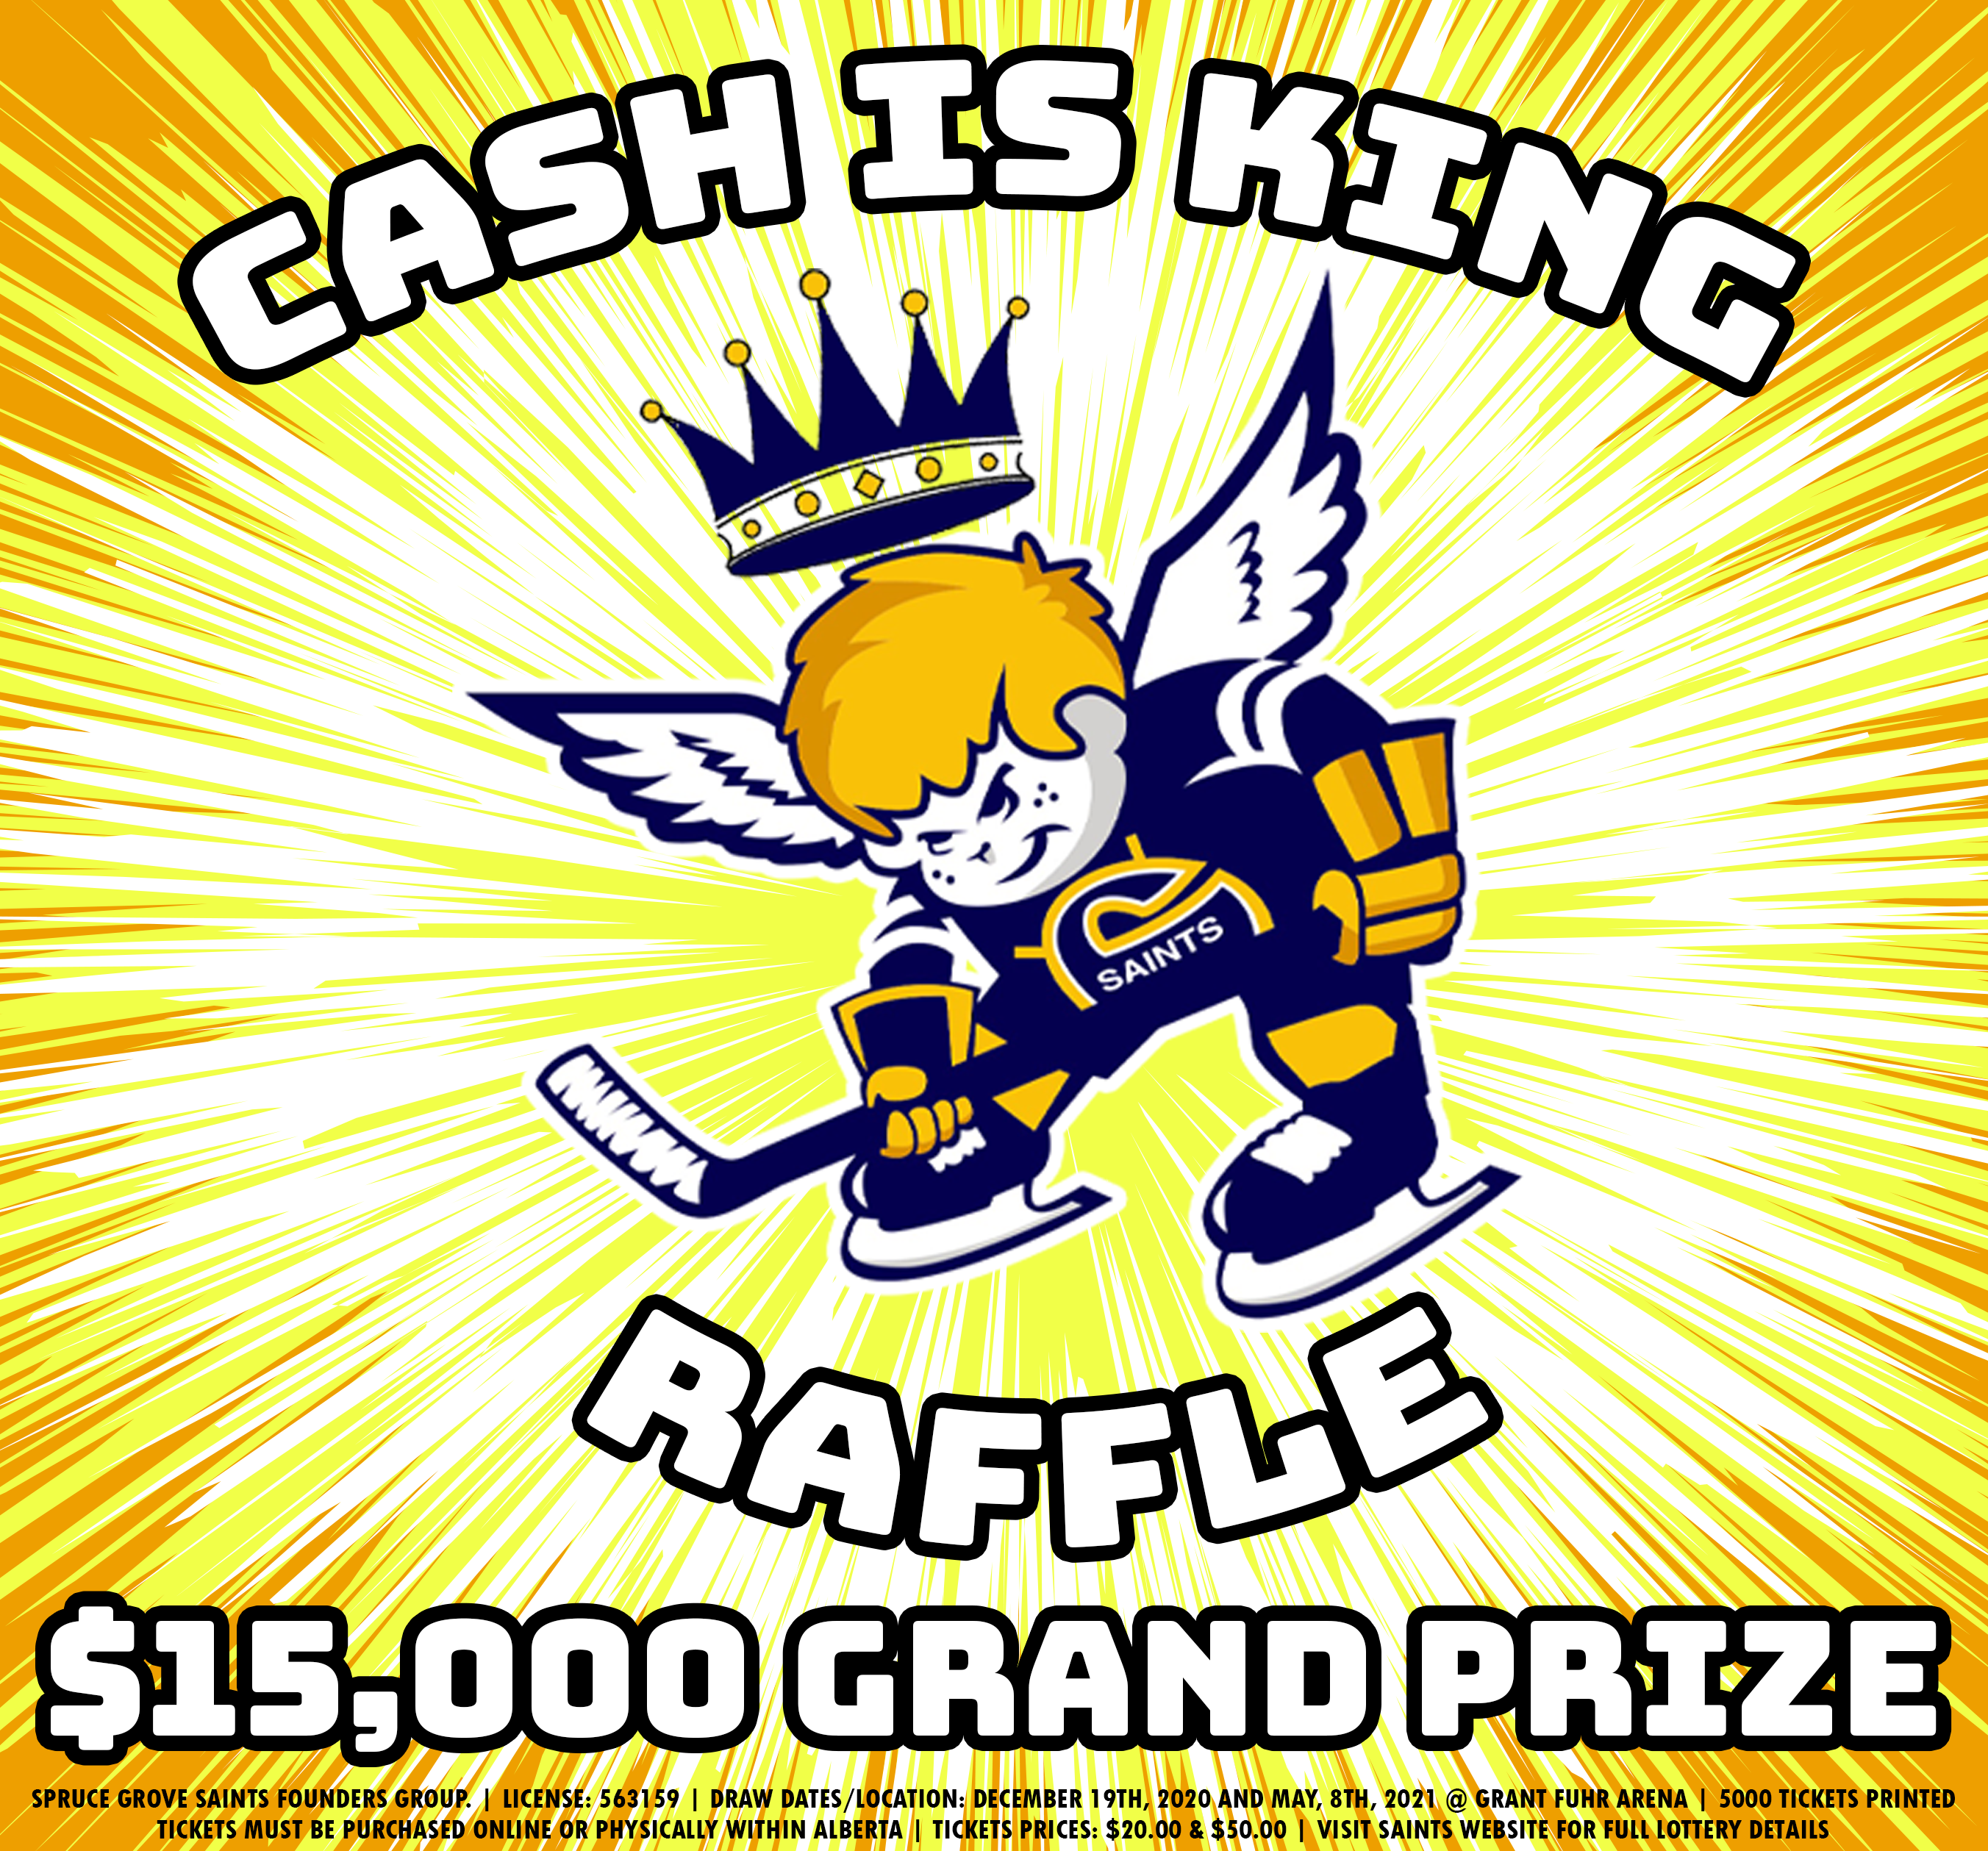 CASH IS KING RAFFLE